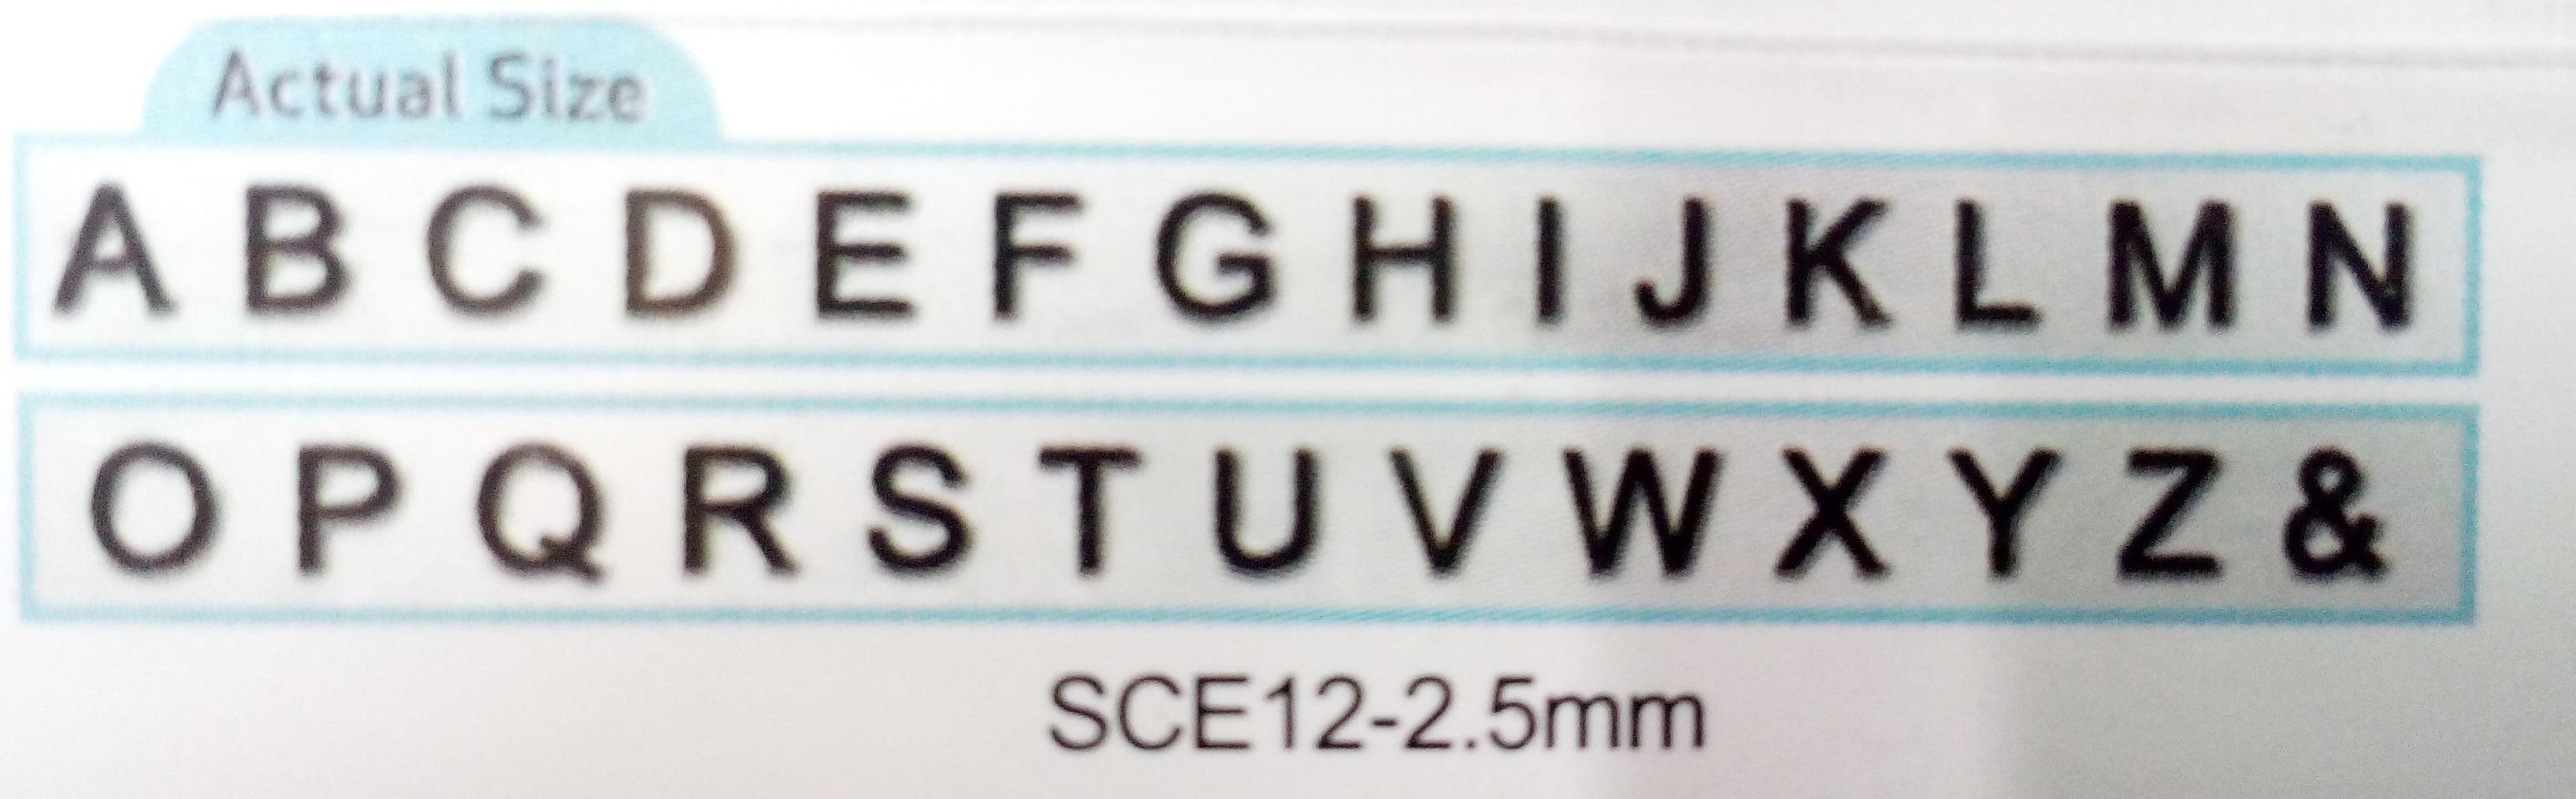 sce12-2-5mm